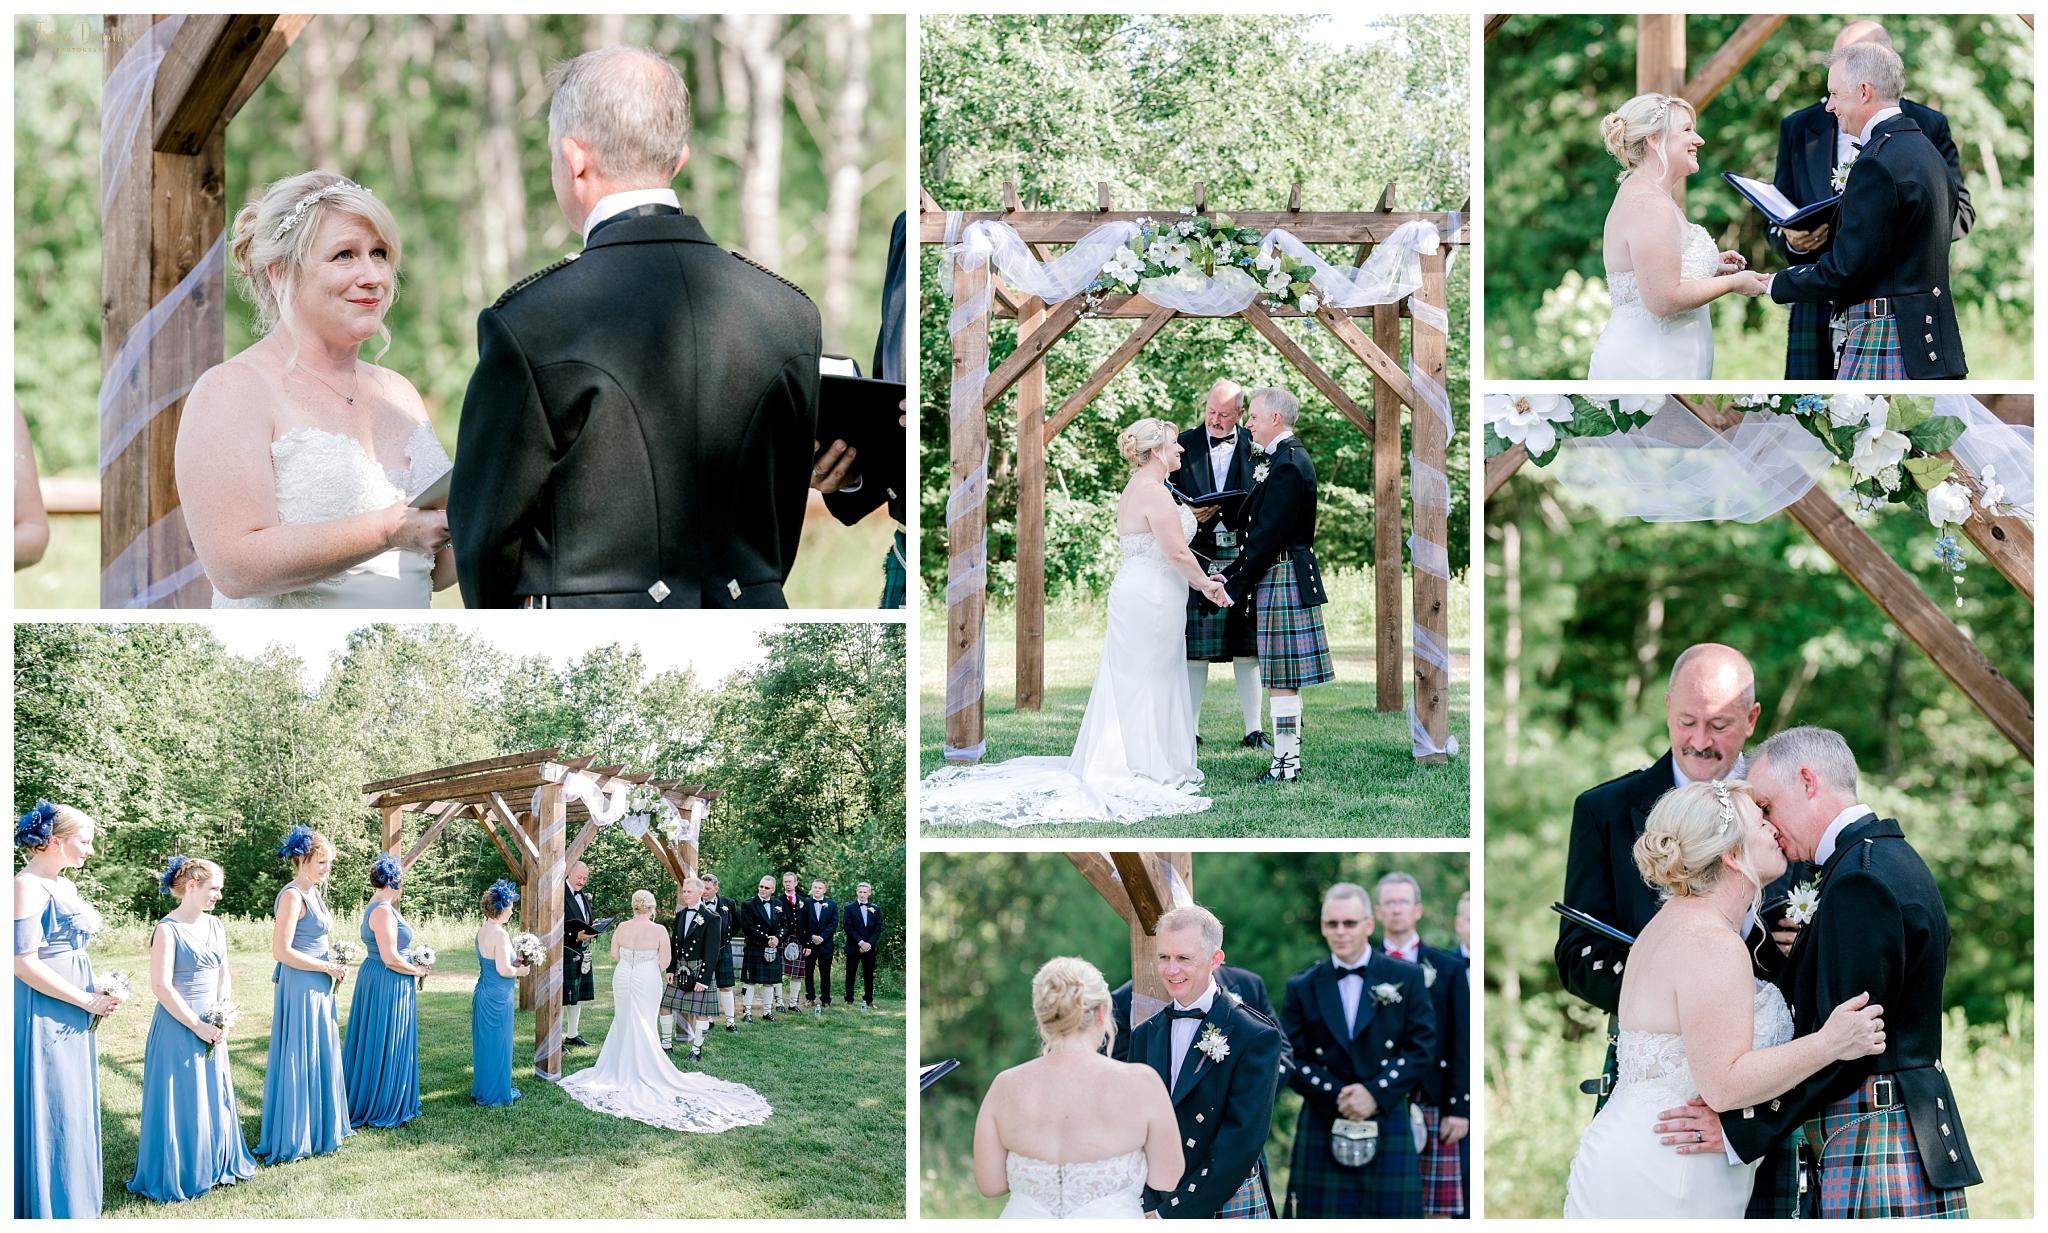 The Hitching Post Scottish Dayton Maine Wedding Ceremony